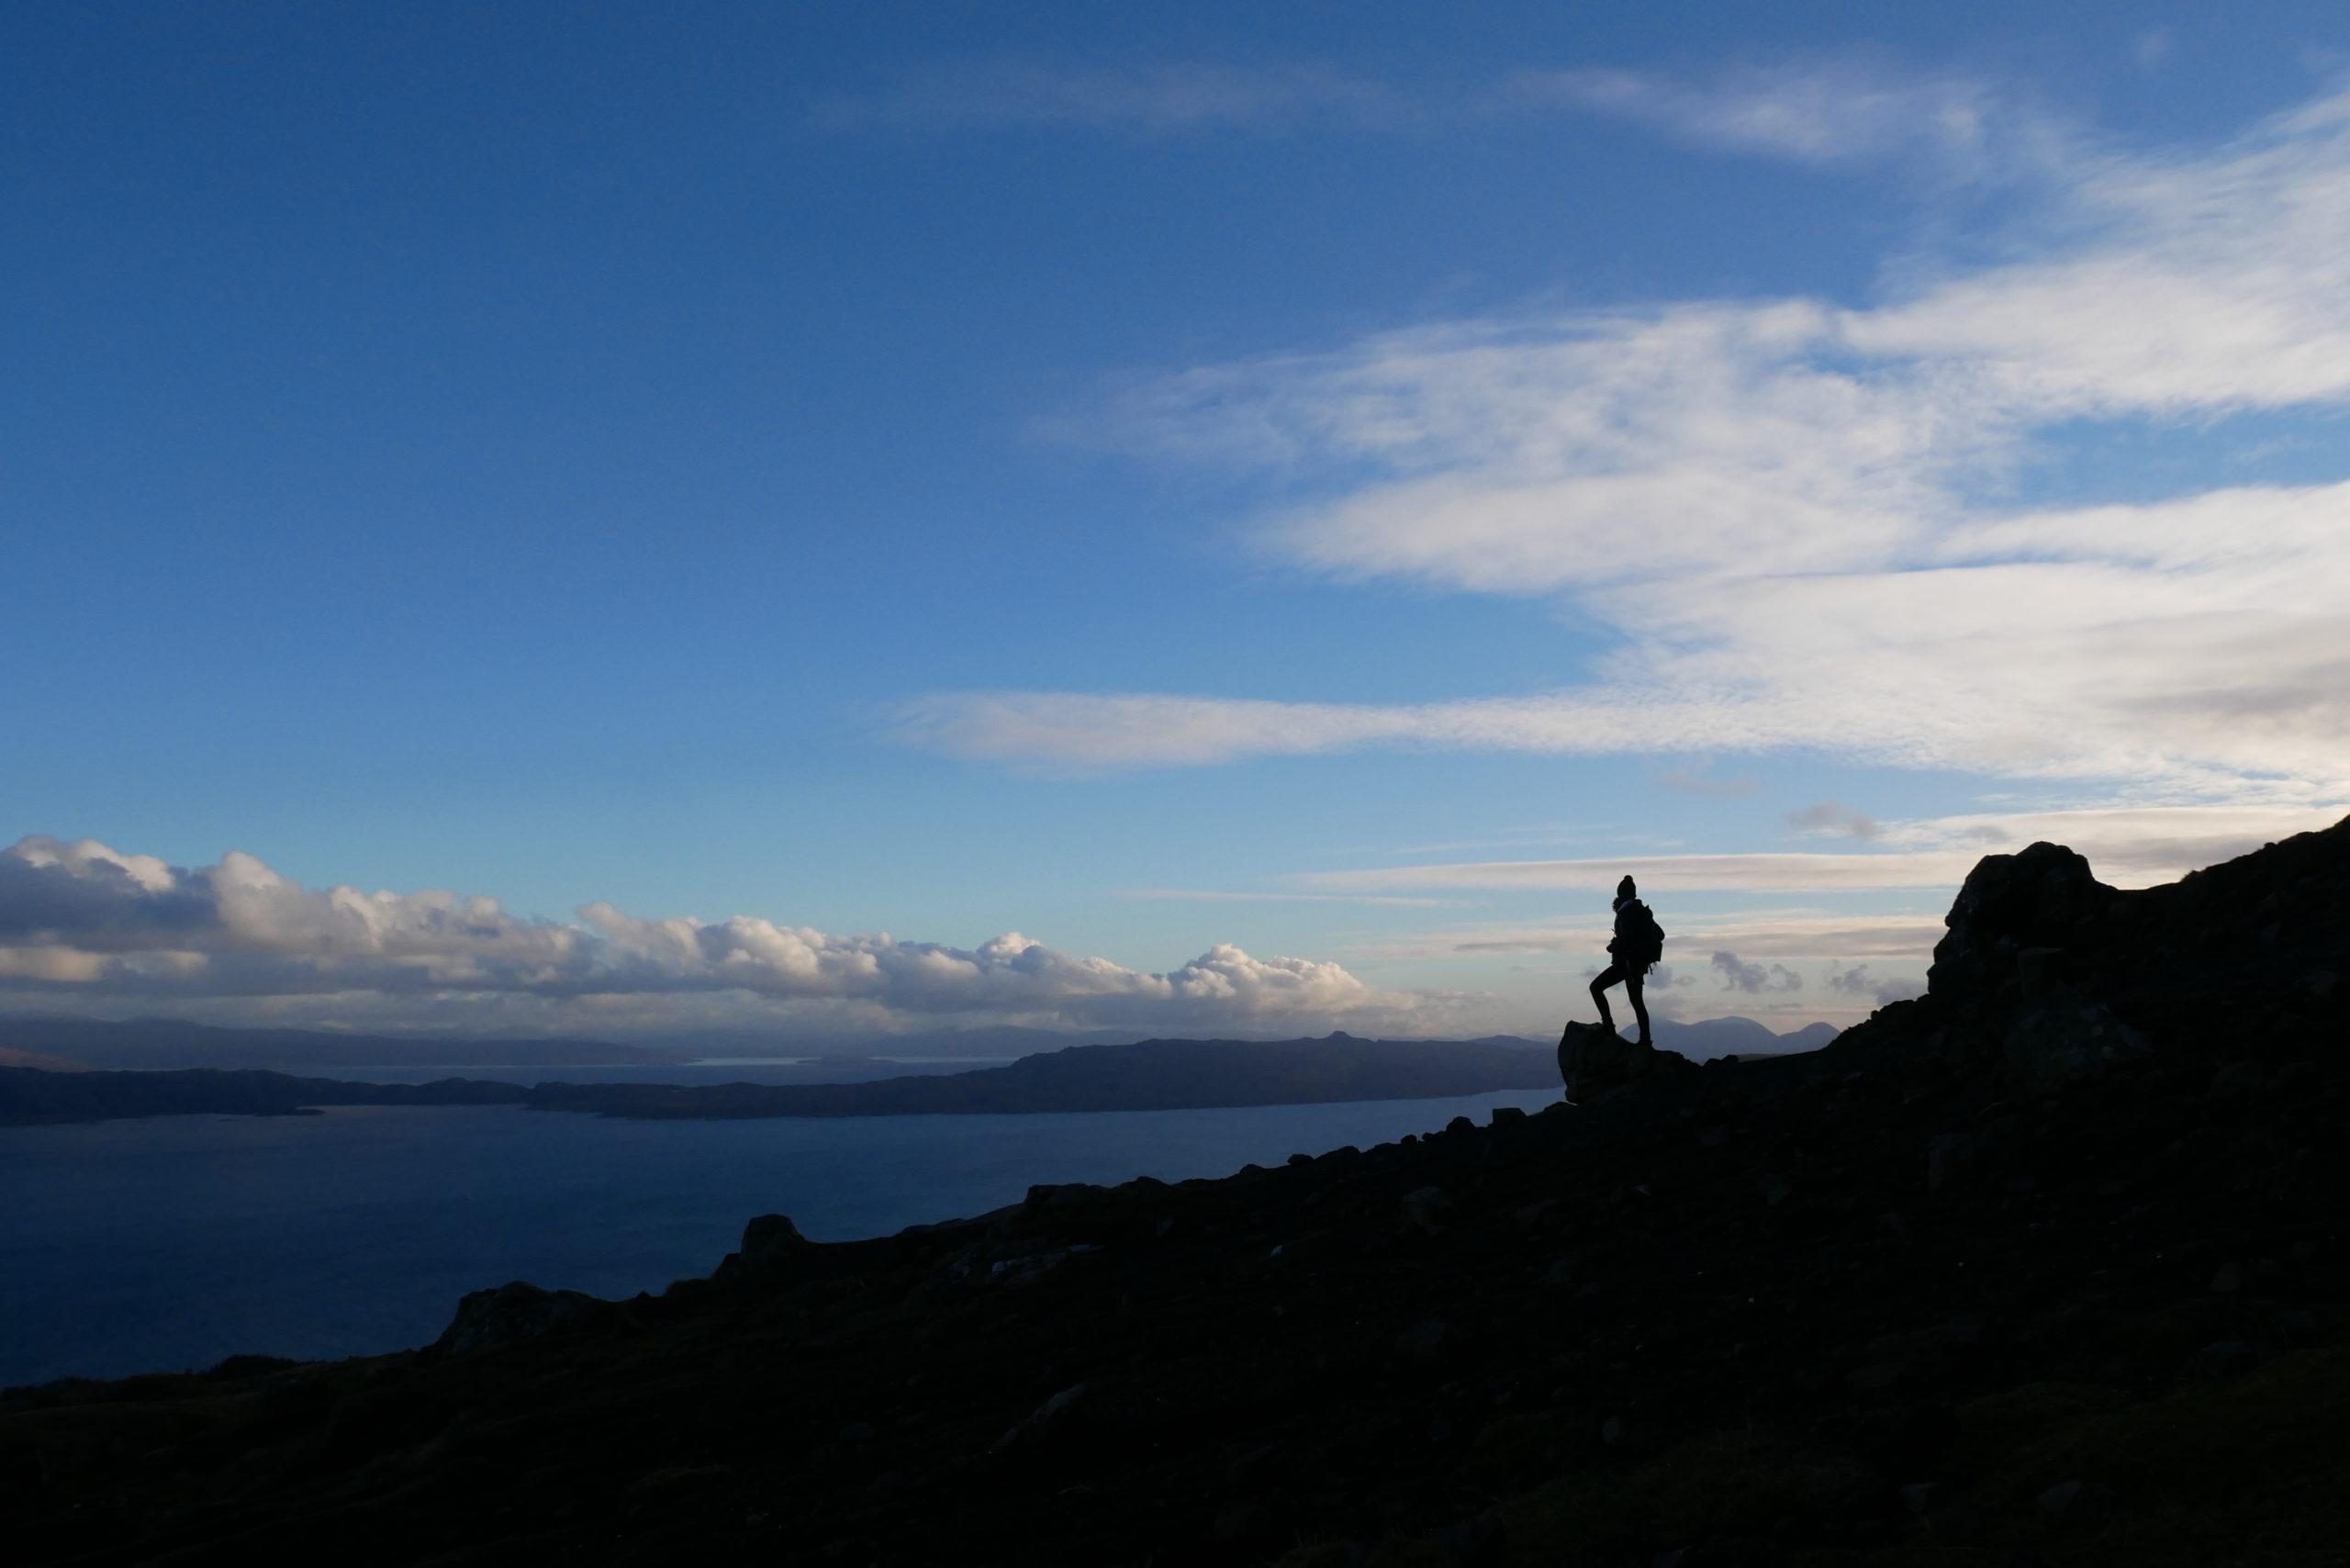 photographie-LumixGX80-scotland-isle-of-skye-ombre